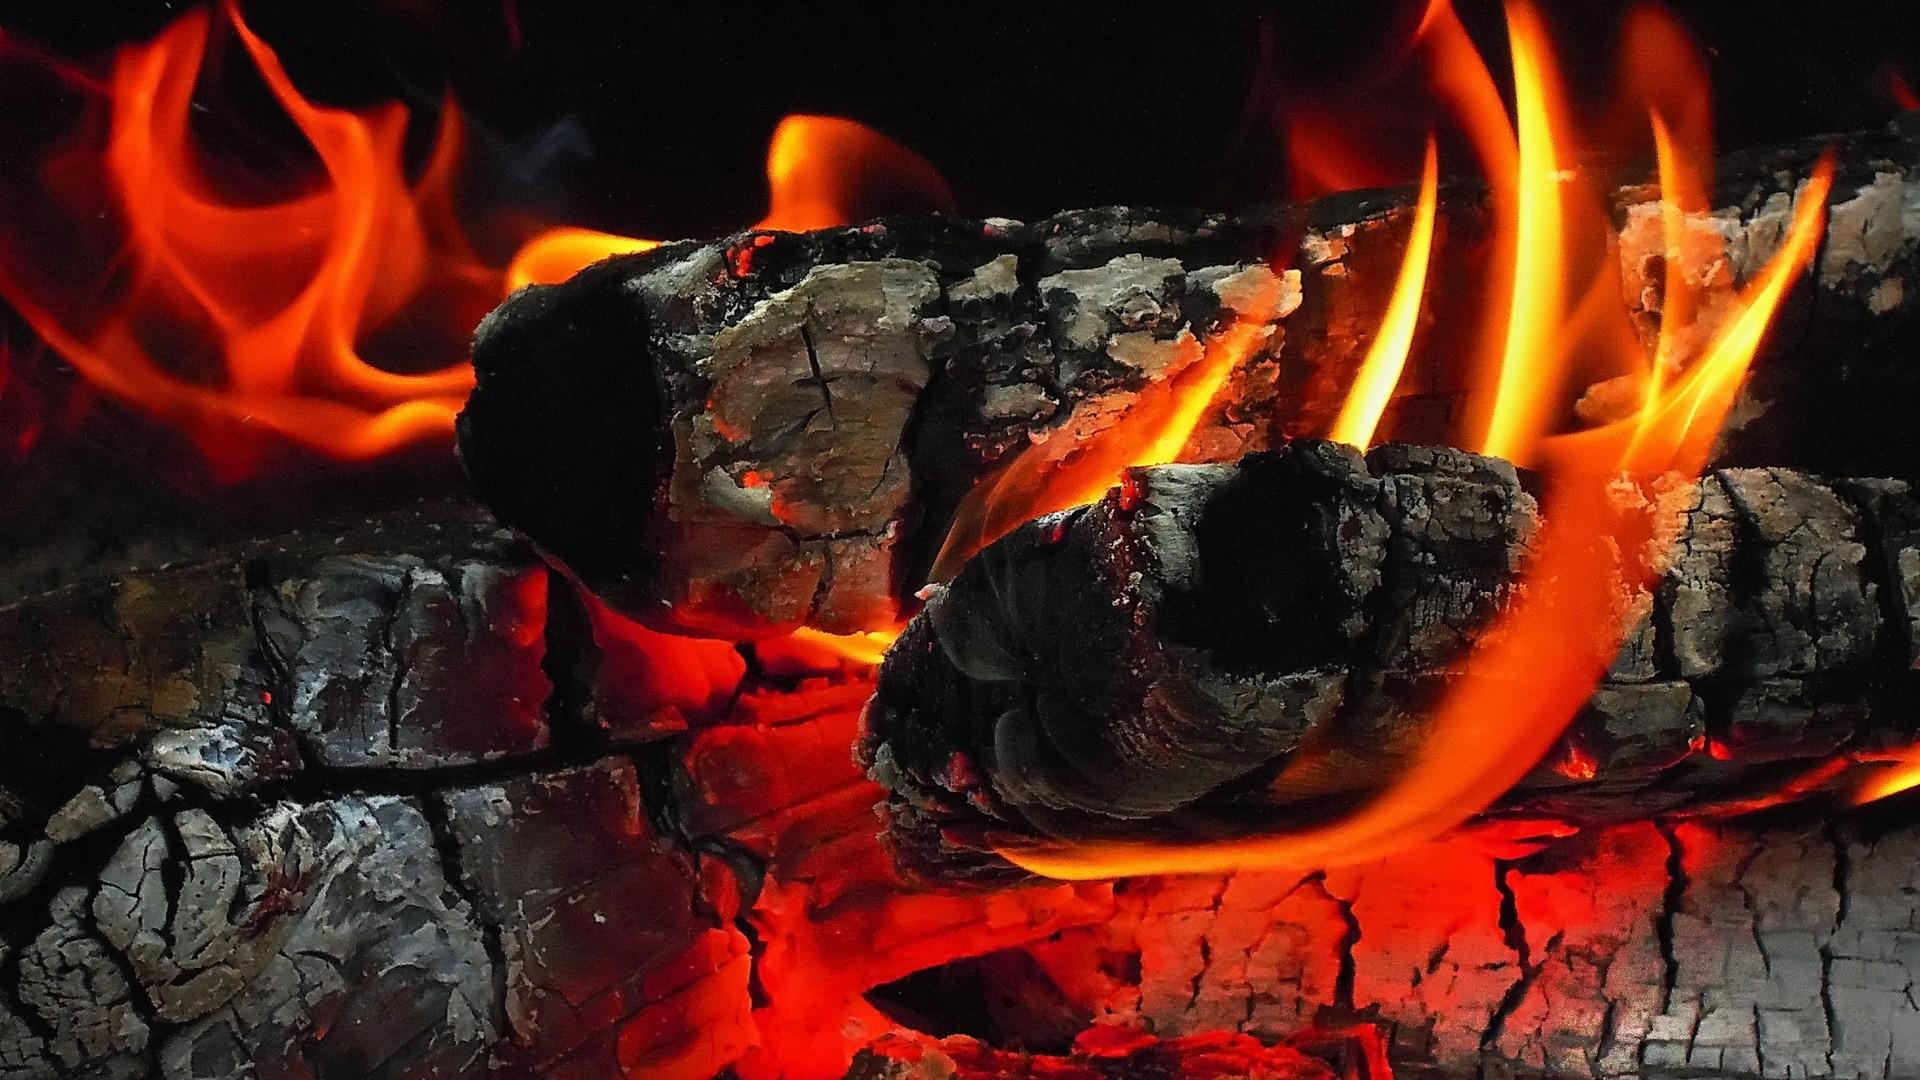 Flame a wallpaper